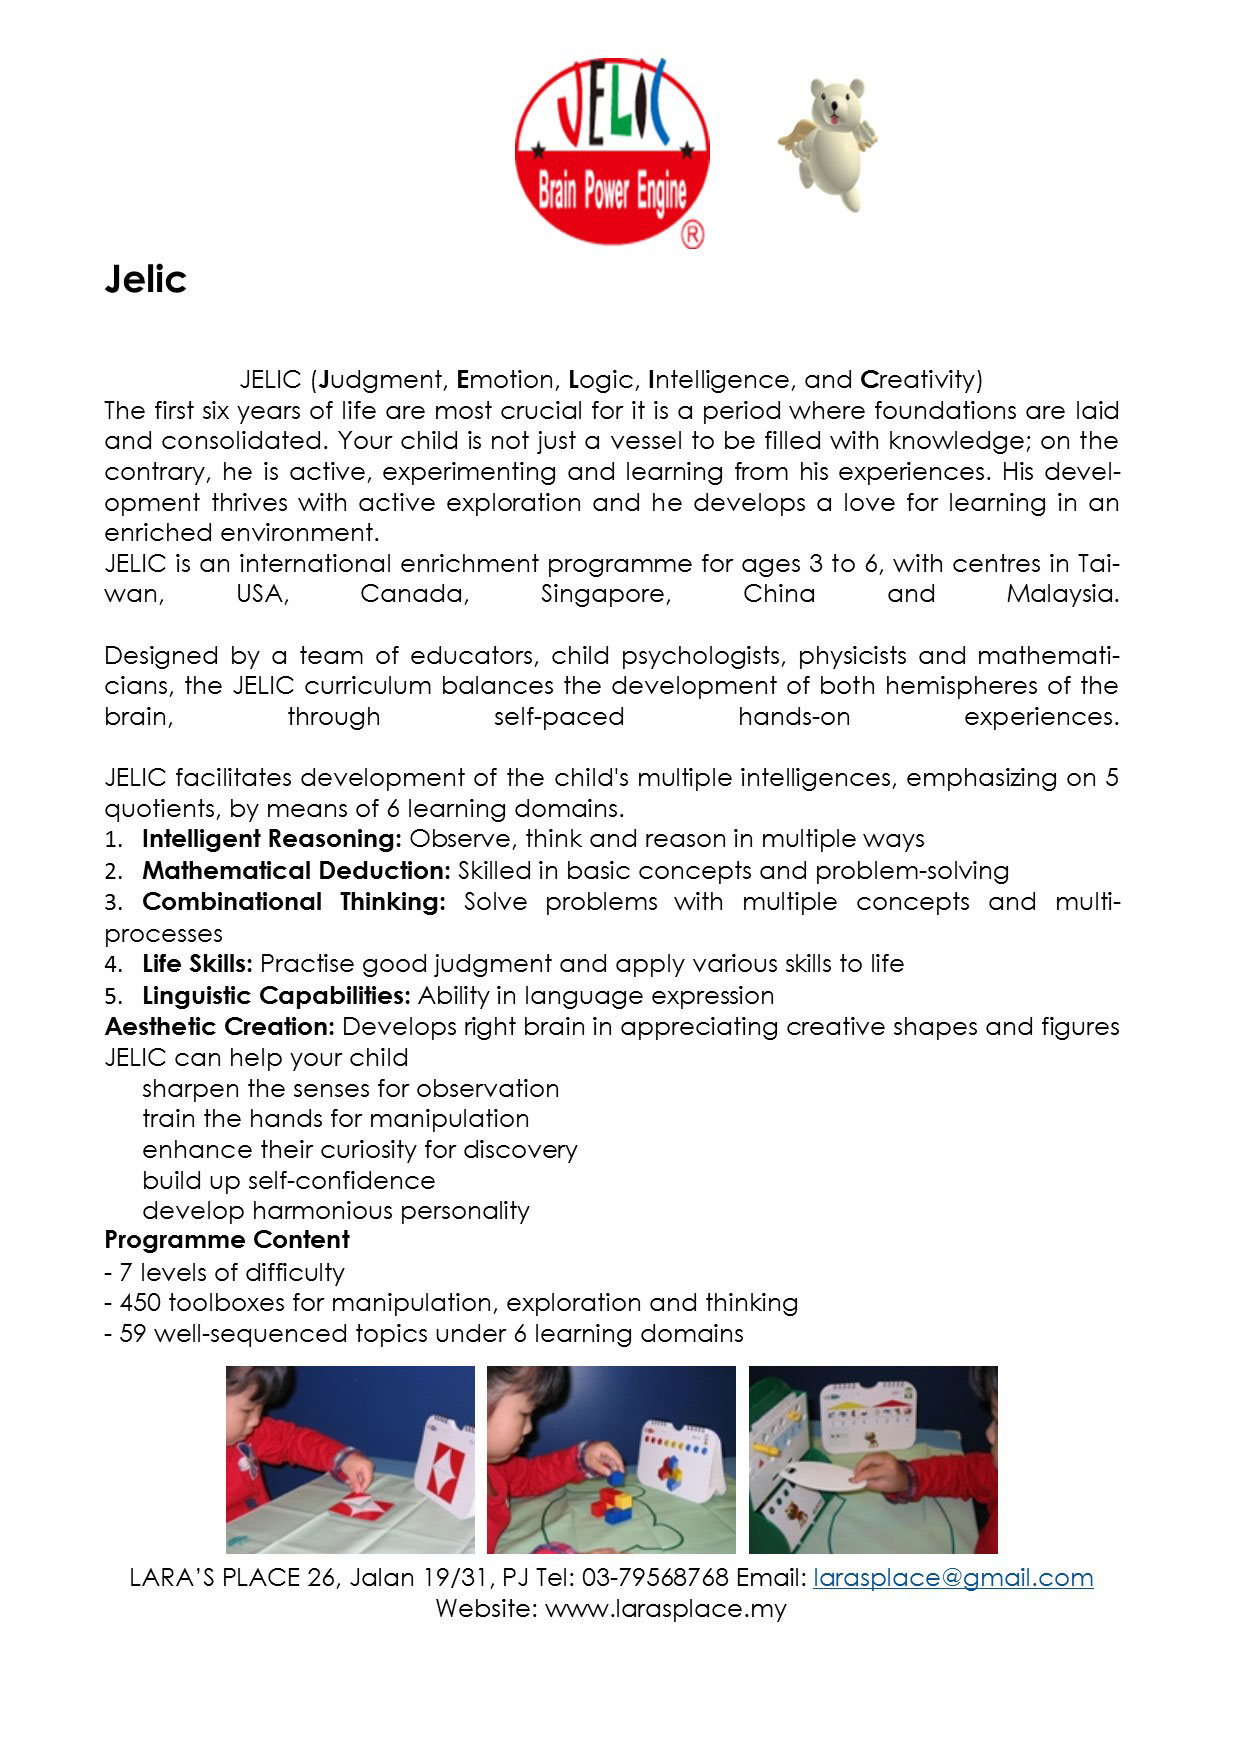 Jelic Multi-Intelligence /Ludia-Brain IQ Activities Holiday Program @ Lara's Place | Petaling Jaya | Selangor | Malaysia